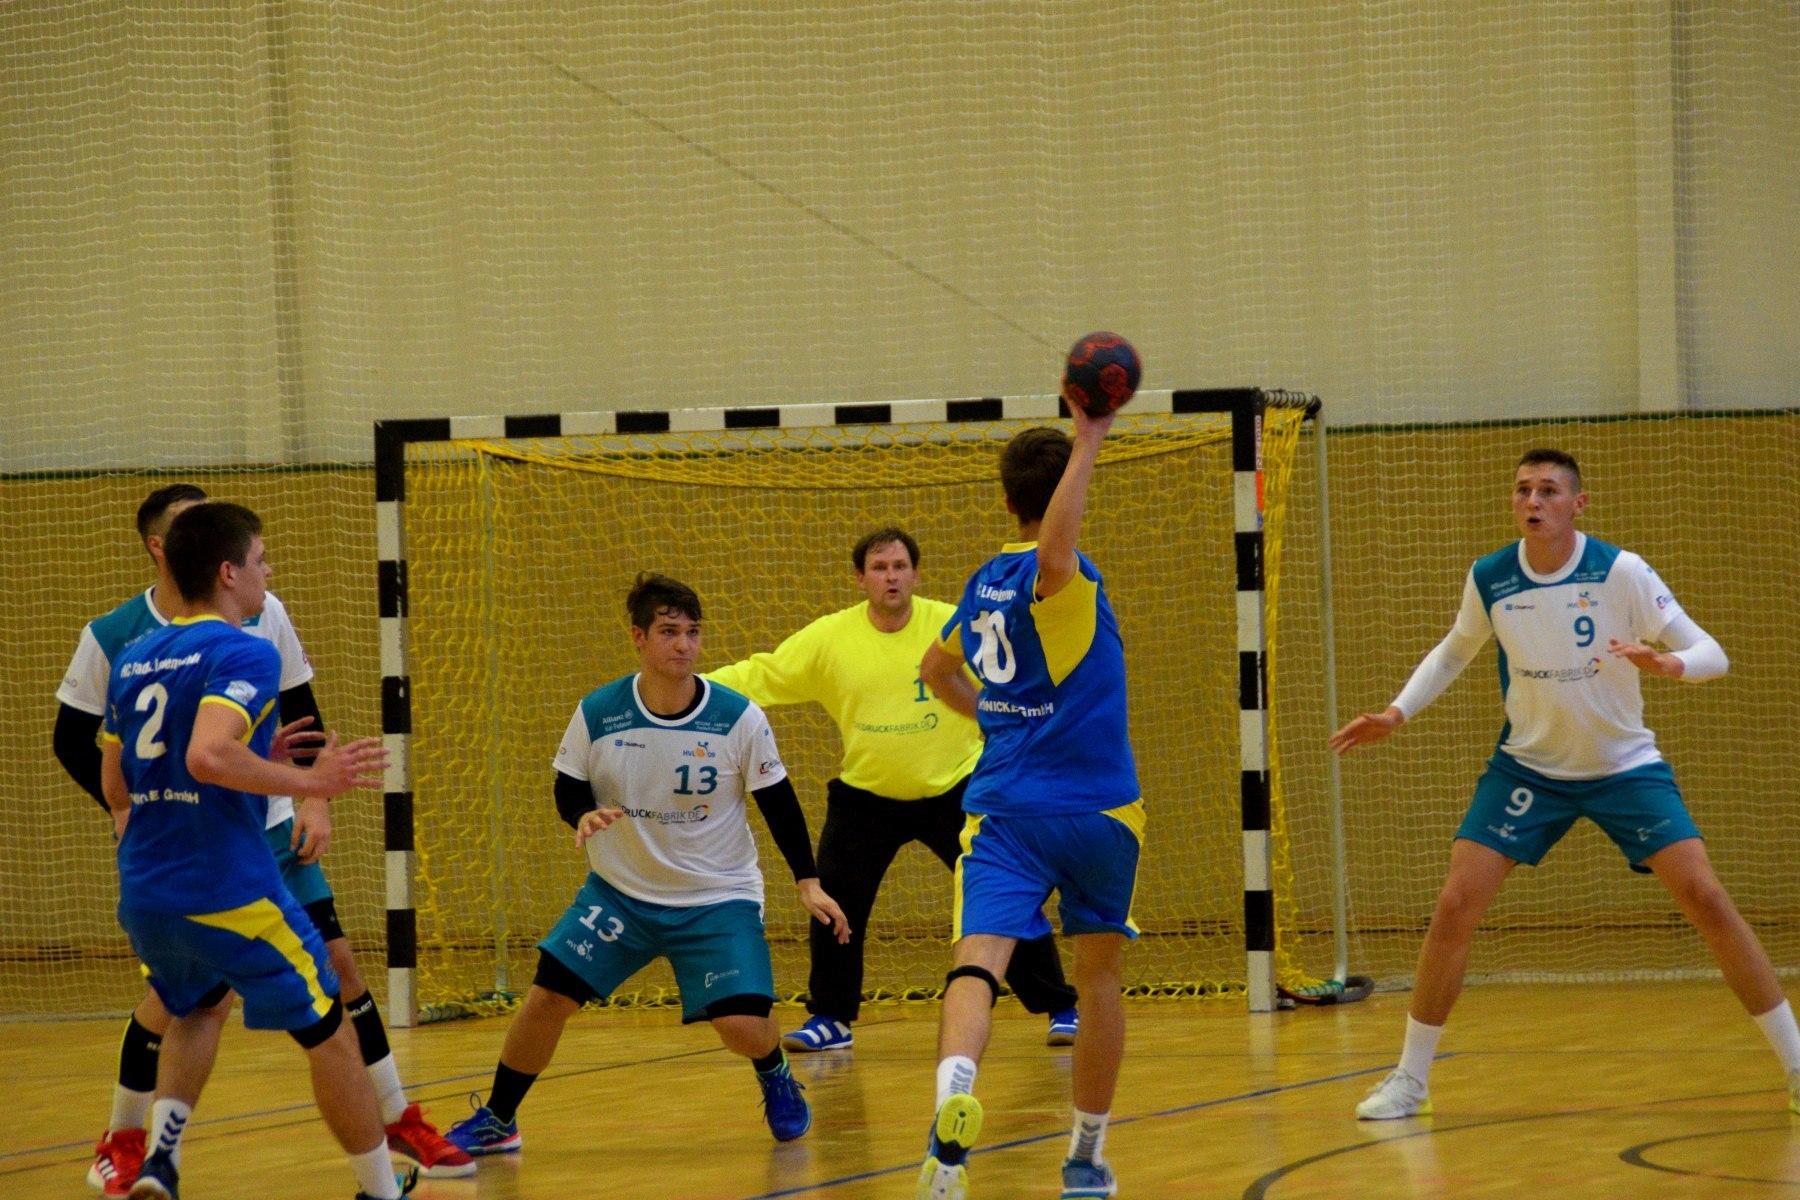 Handball Luckenwalde